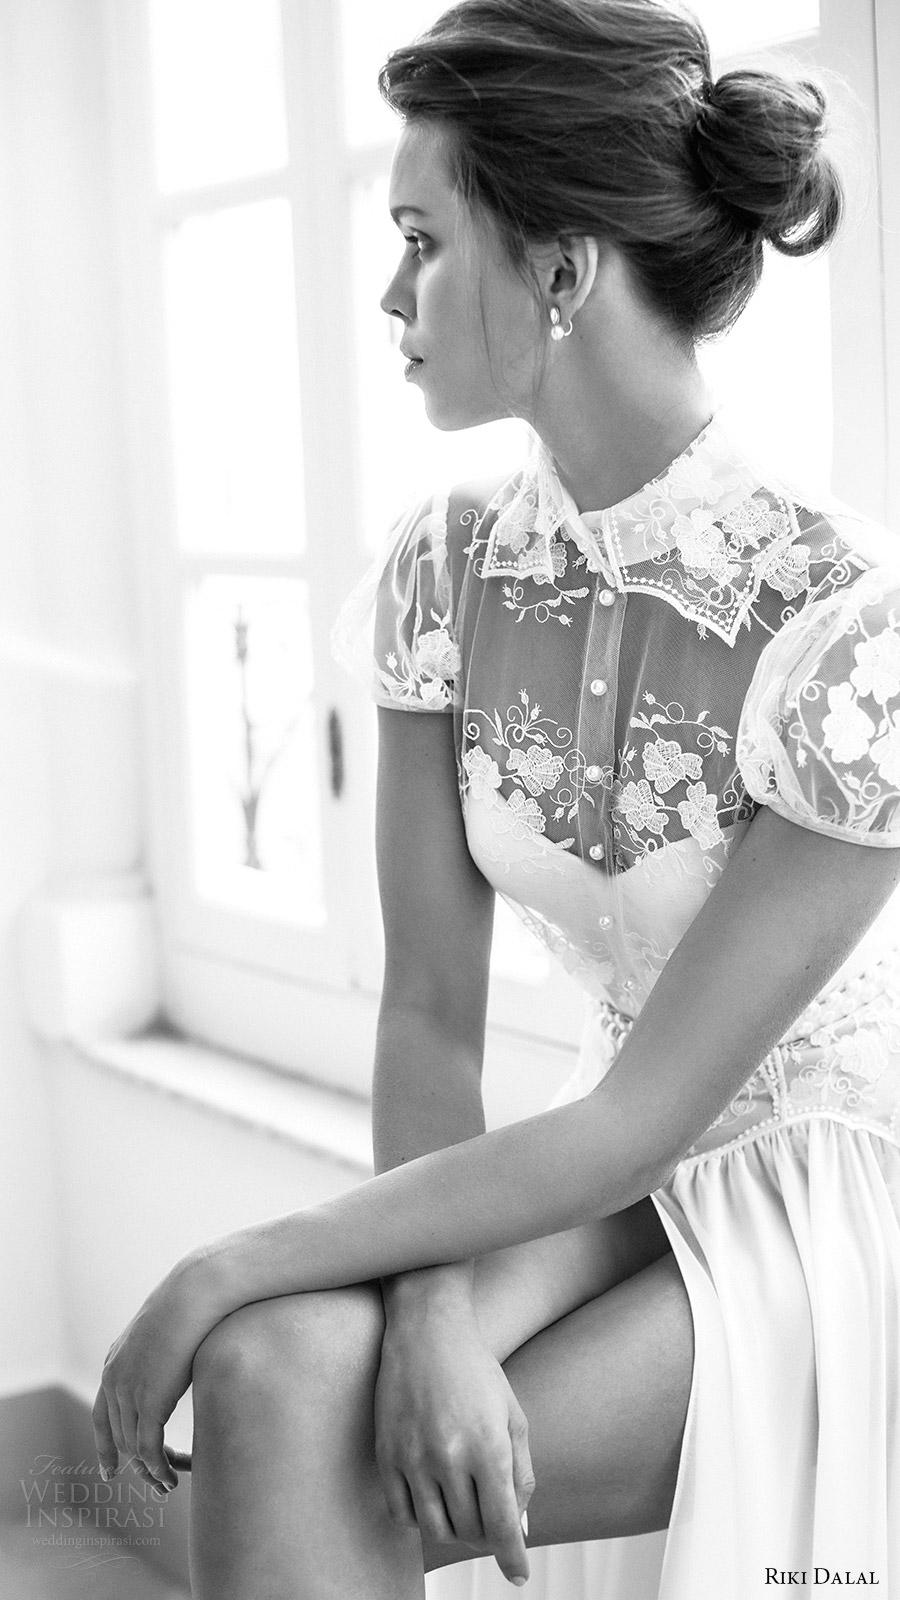 riki dalal bridal 2016 short puff sleeves sweetheart illusion collar shirt bodice a line wedding dress (1802) zv romantic slit skirt